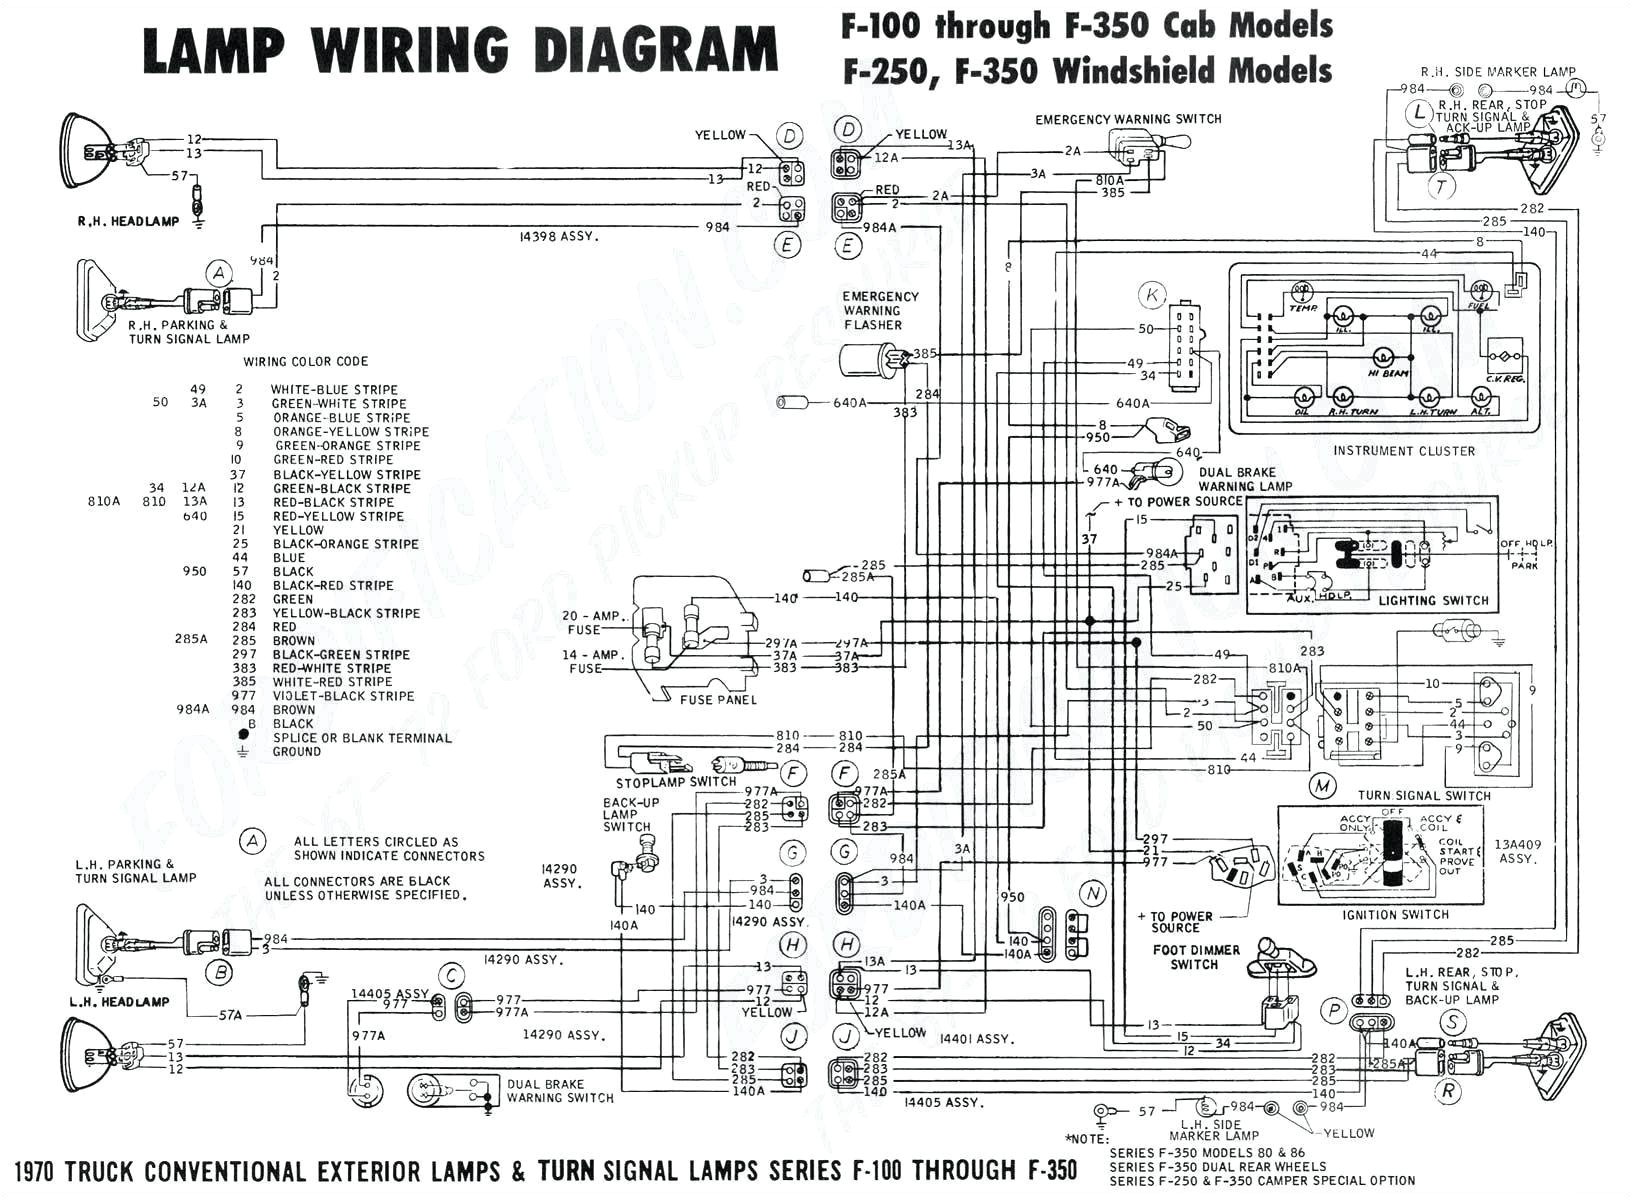 2007 international 4300 wiring diagram new international truck wiring diagram besides international truck fuse of 2007 international 4300 wiring diagram jpg